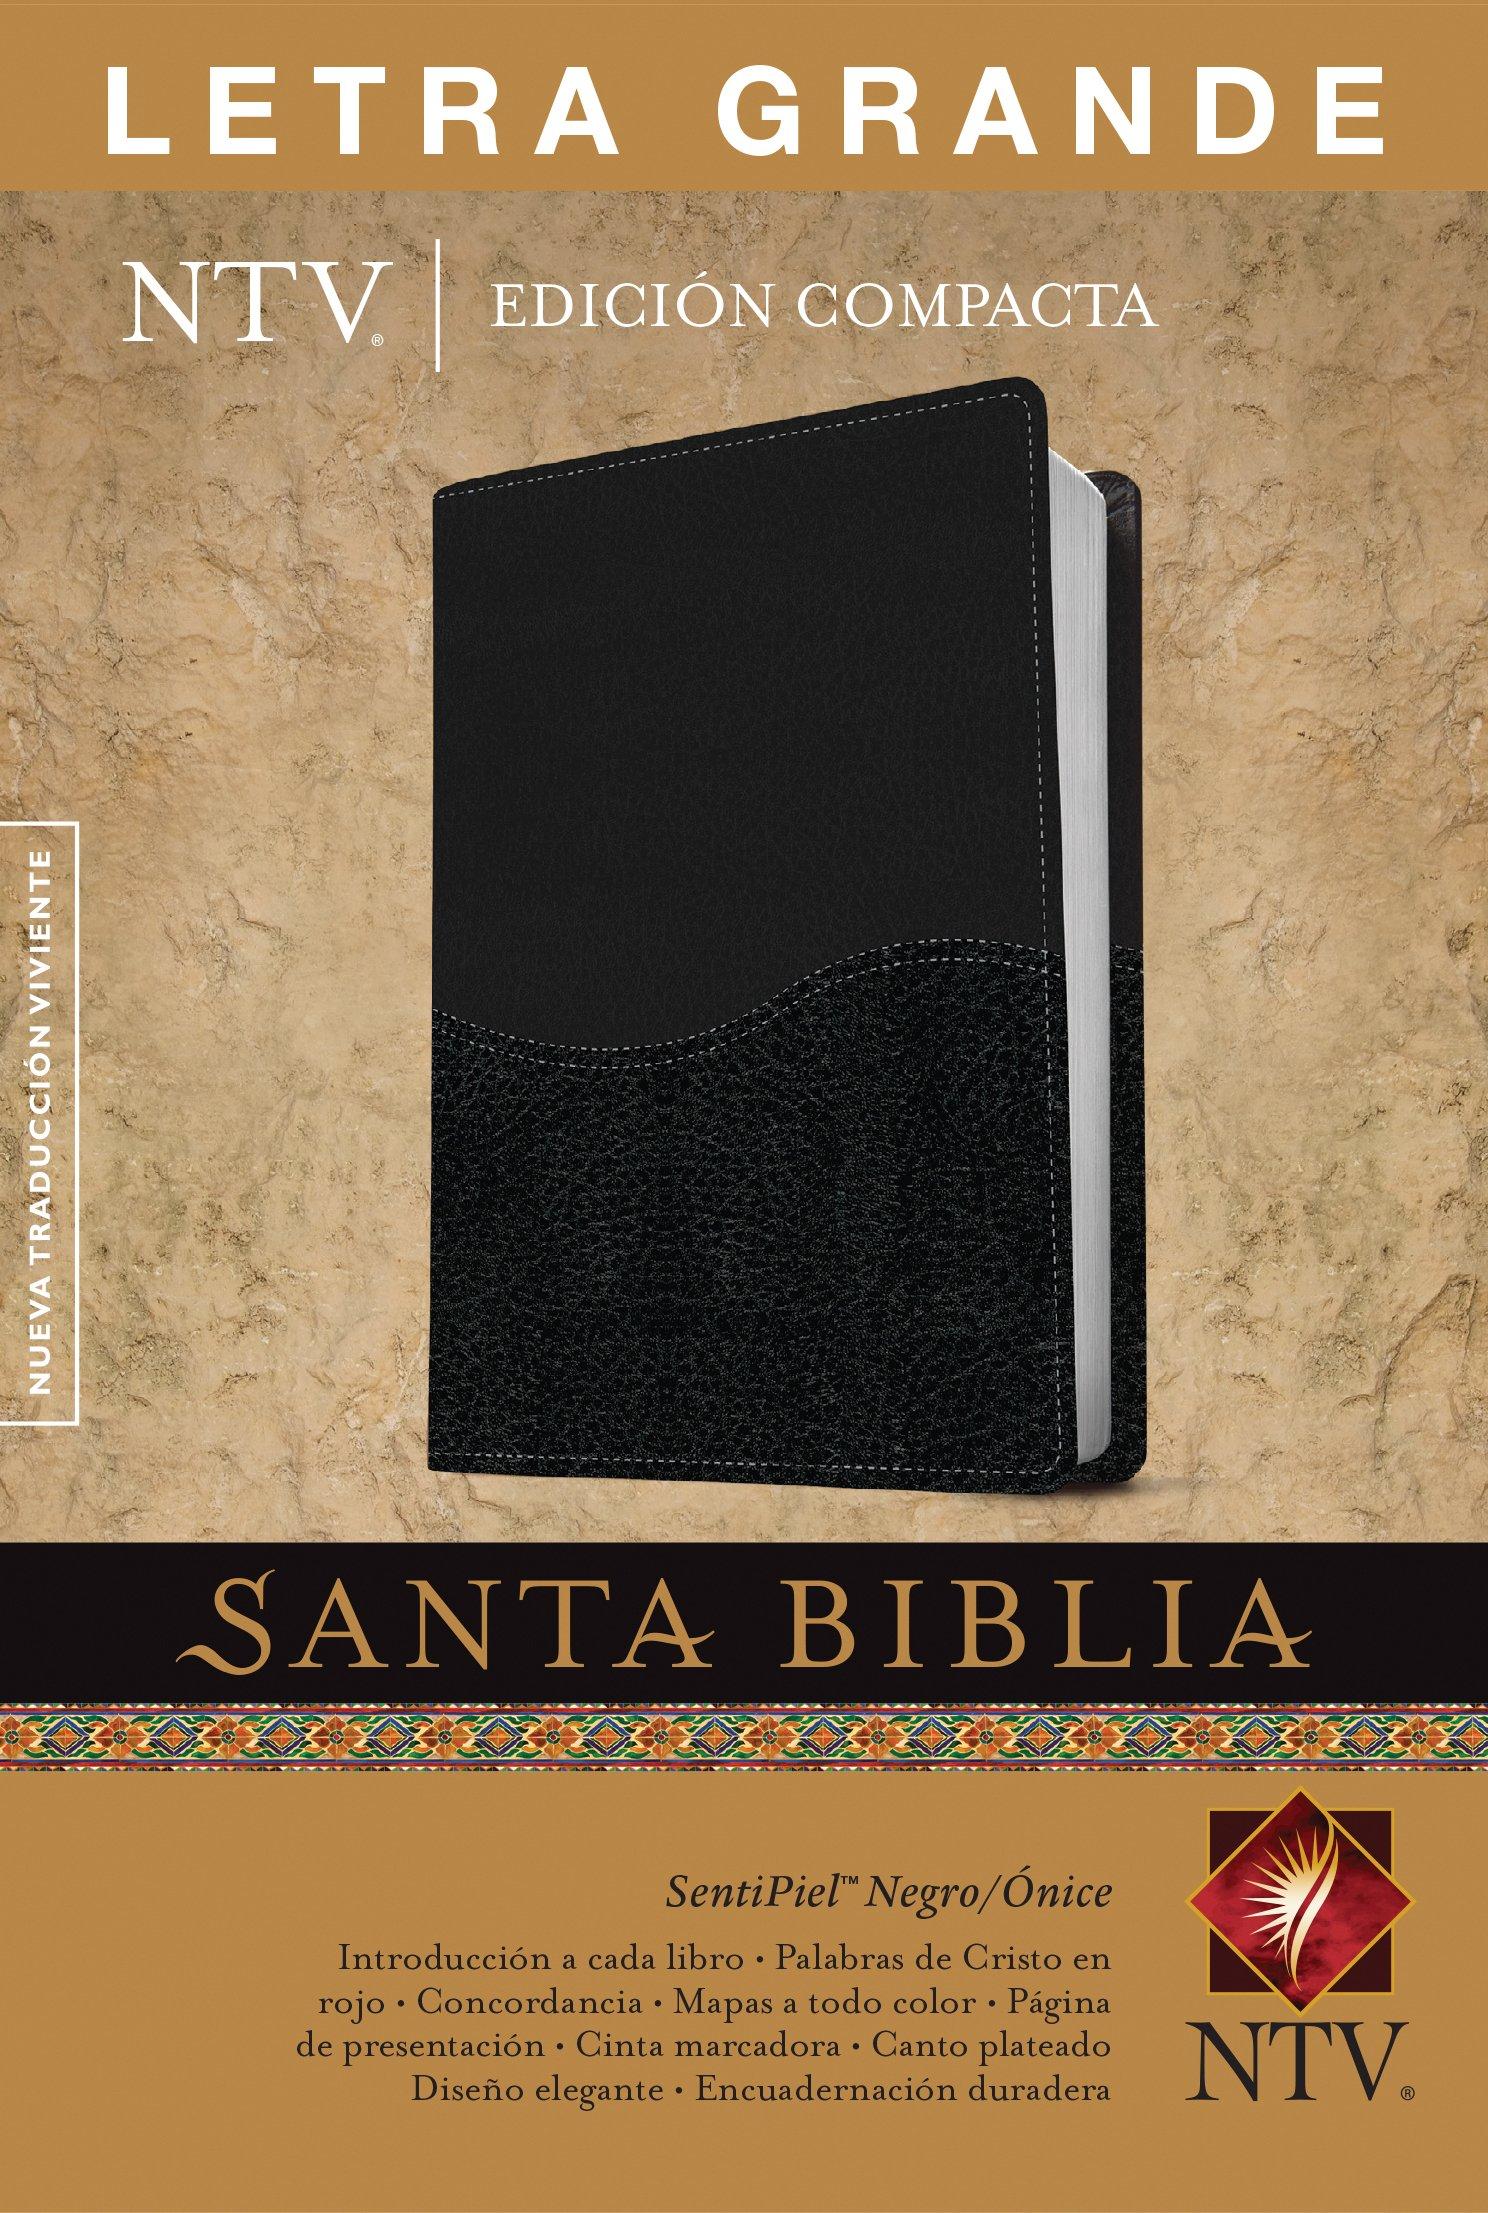 Biblia NTV Edición compacta - Letra Grande